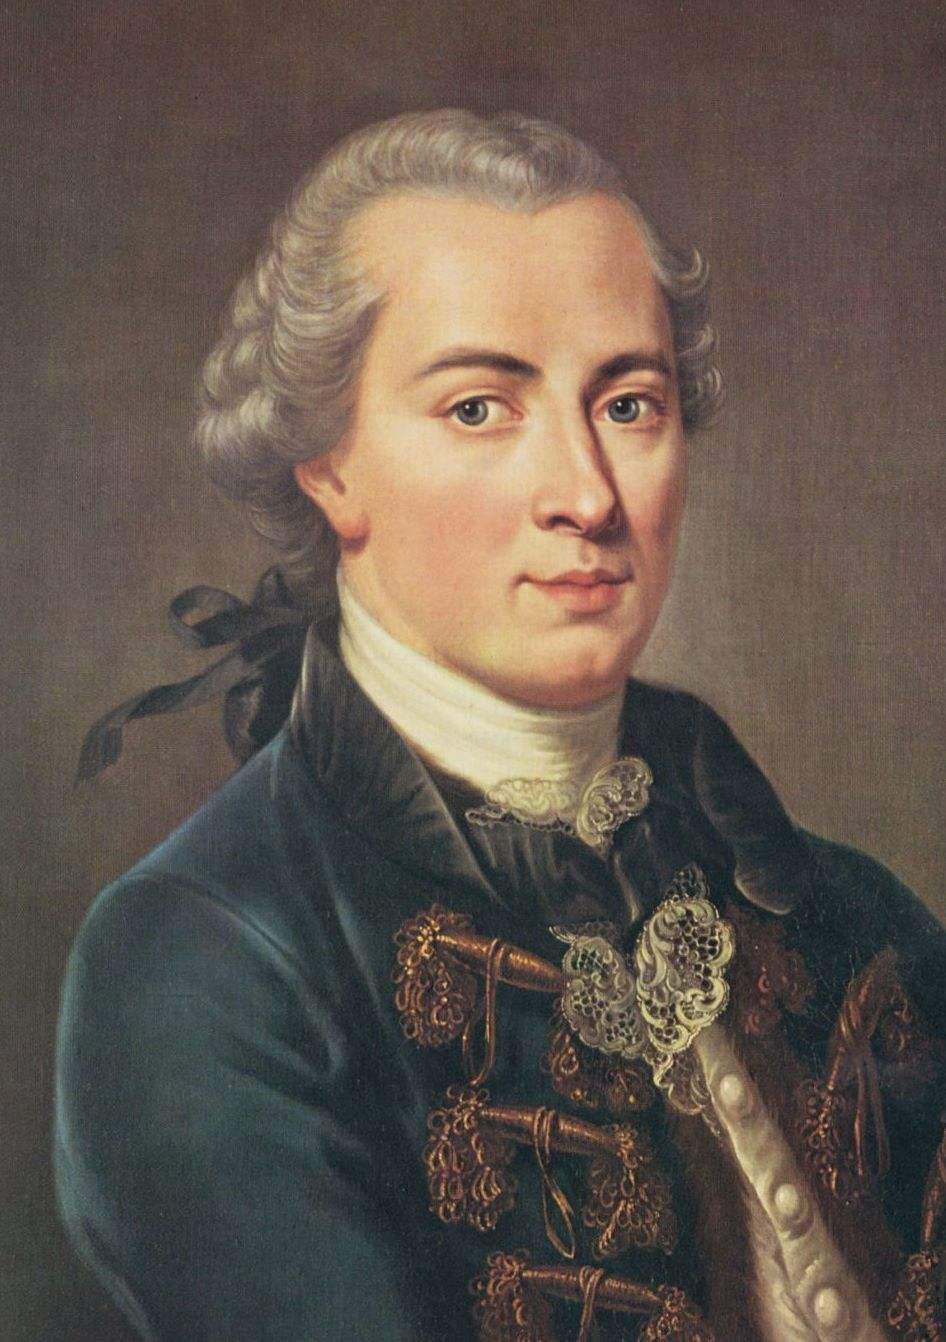 Emmanuel-Kant.jpg